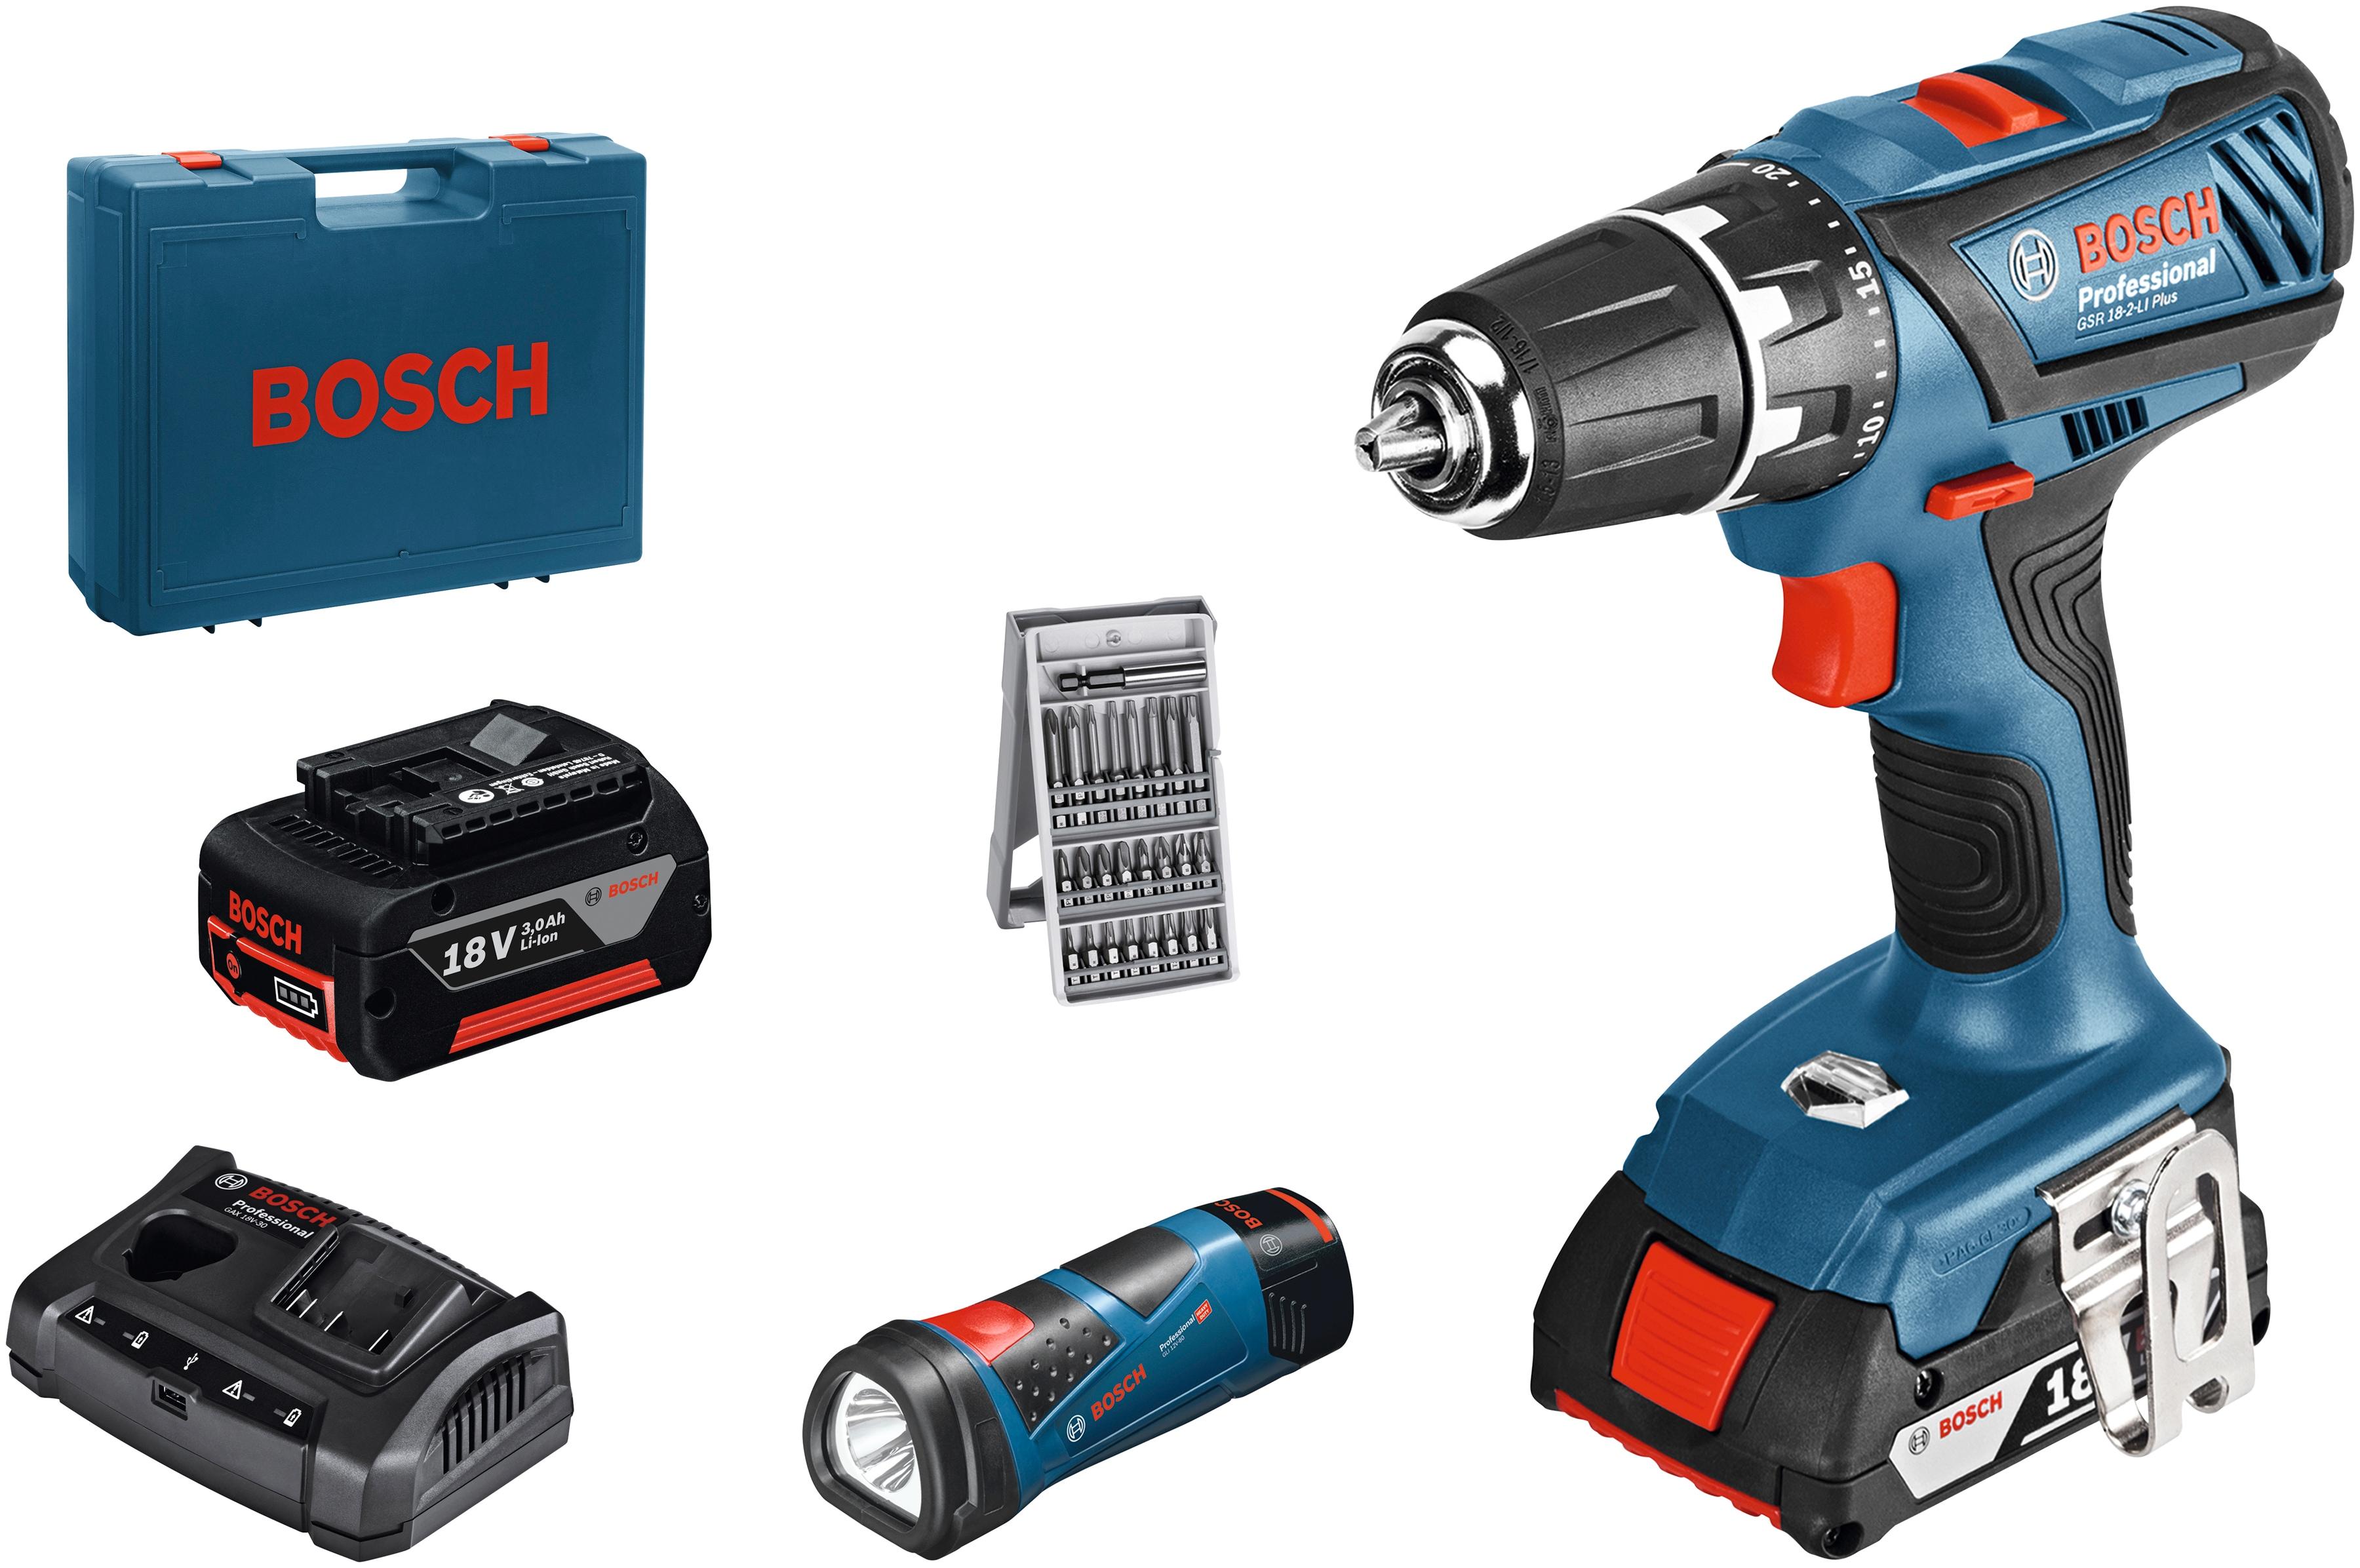 BOSCH PROFESSIONAL Elektrowerkzeug-Set »GSR 18-2-LI Plus + GLI 12V-80 + GAX Multi-Bay« | Baumarkt > Werkzeug > Werkzeug-Sets | Blau | BOSCH PROFESSIONAL